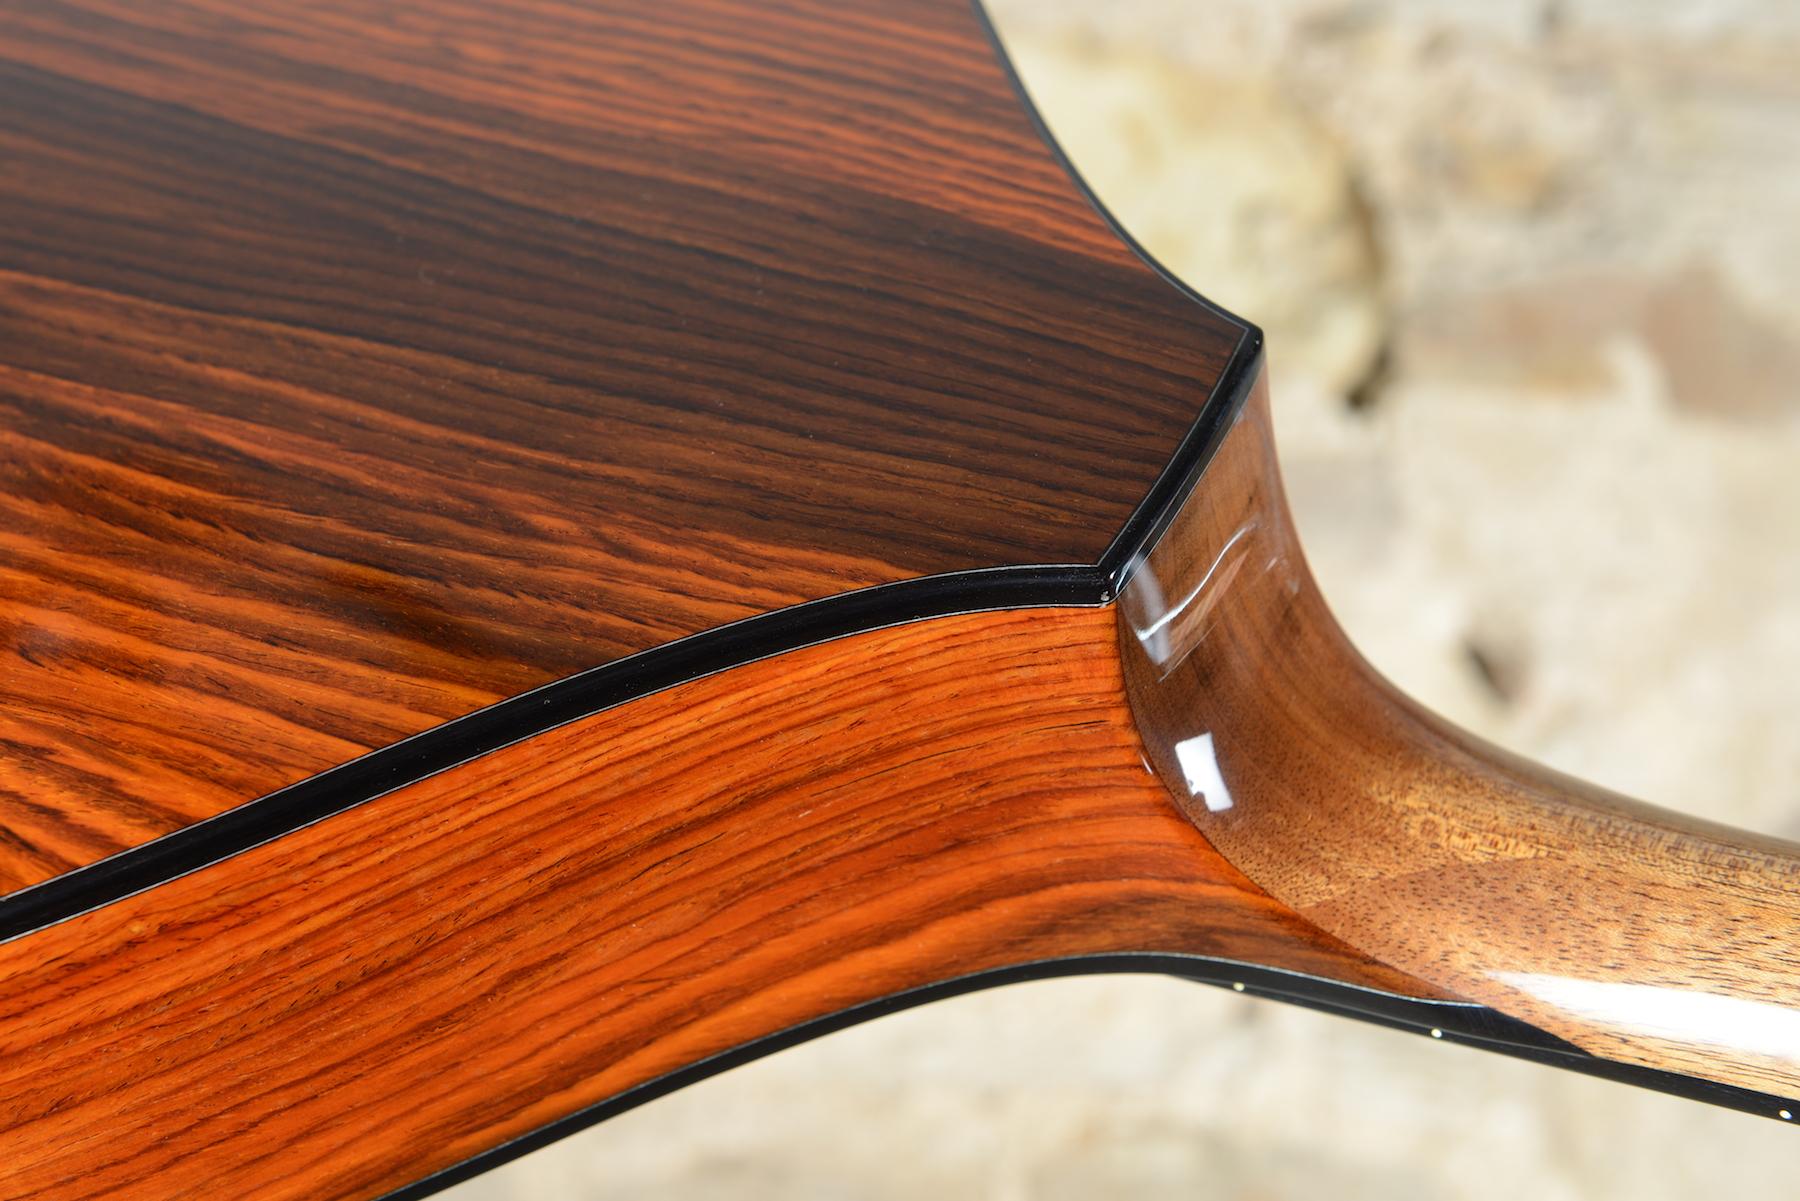 Portuguese Guitar / Sobell neck joint